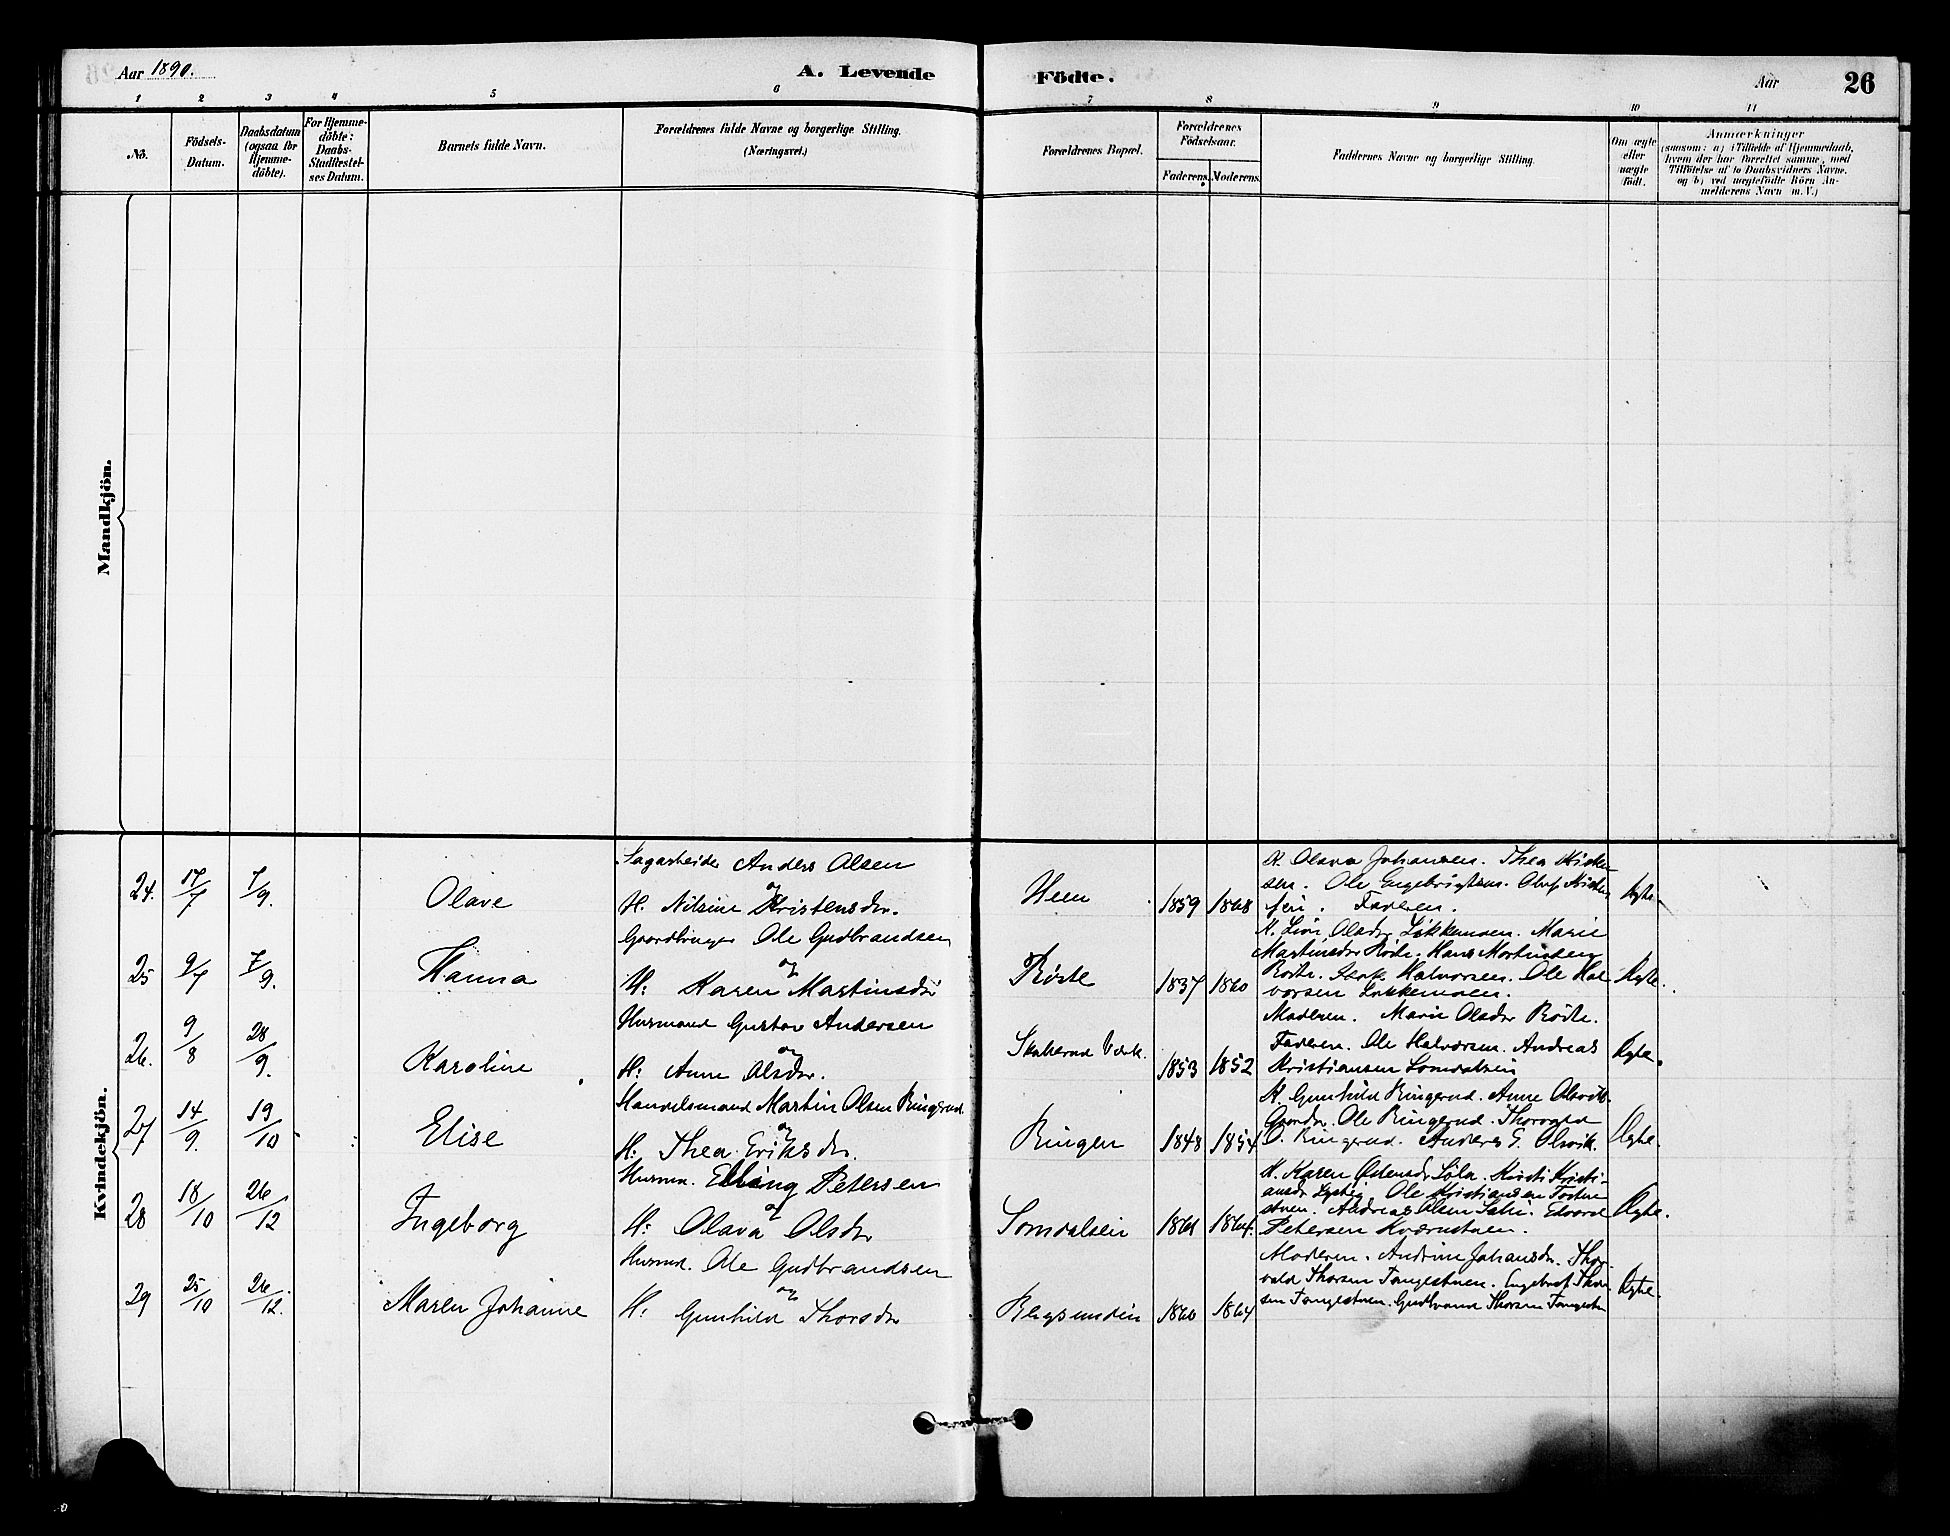 SAKO, Ådal kirkebøker, F/Fb/L0001: Ministerialbok nr. II 1, 1884-1897, s. 26